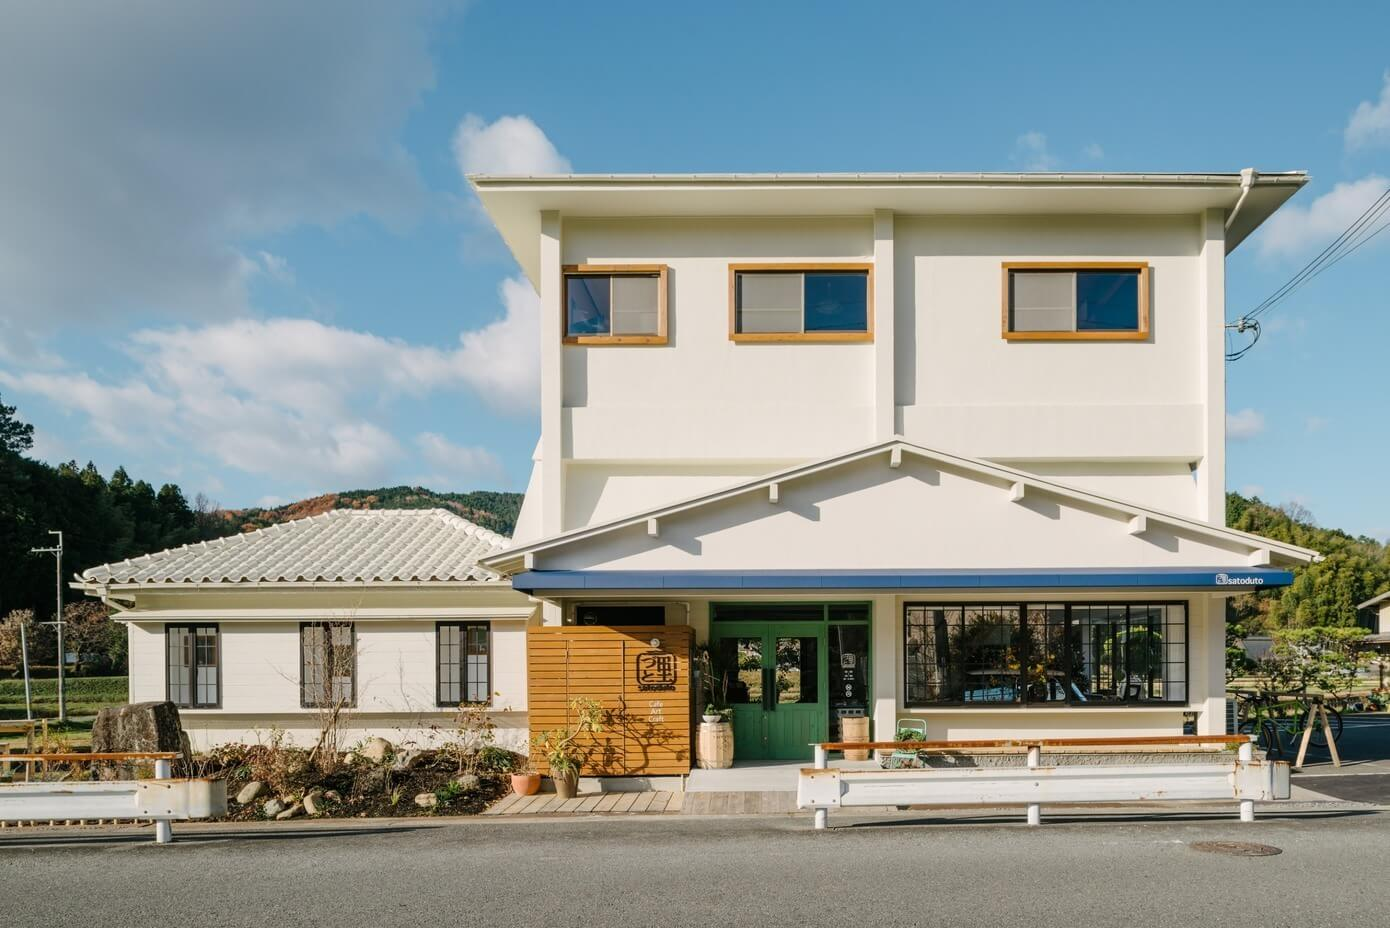 satoduto-coil-kazuteru-matumura-architects-18